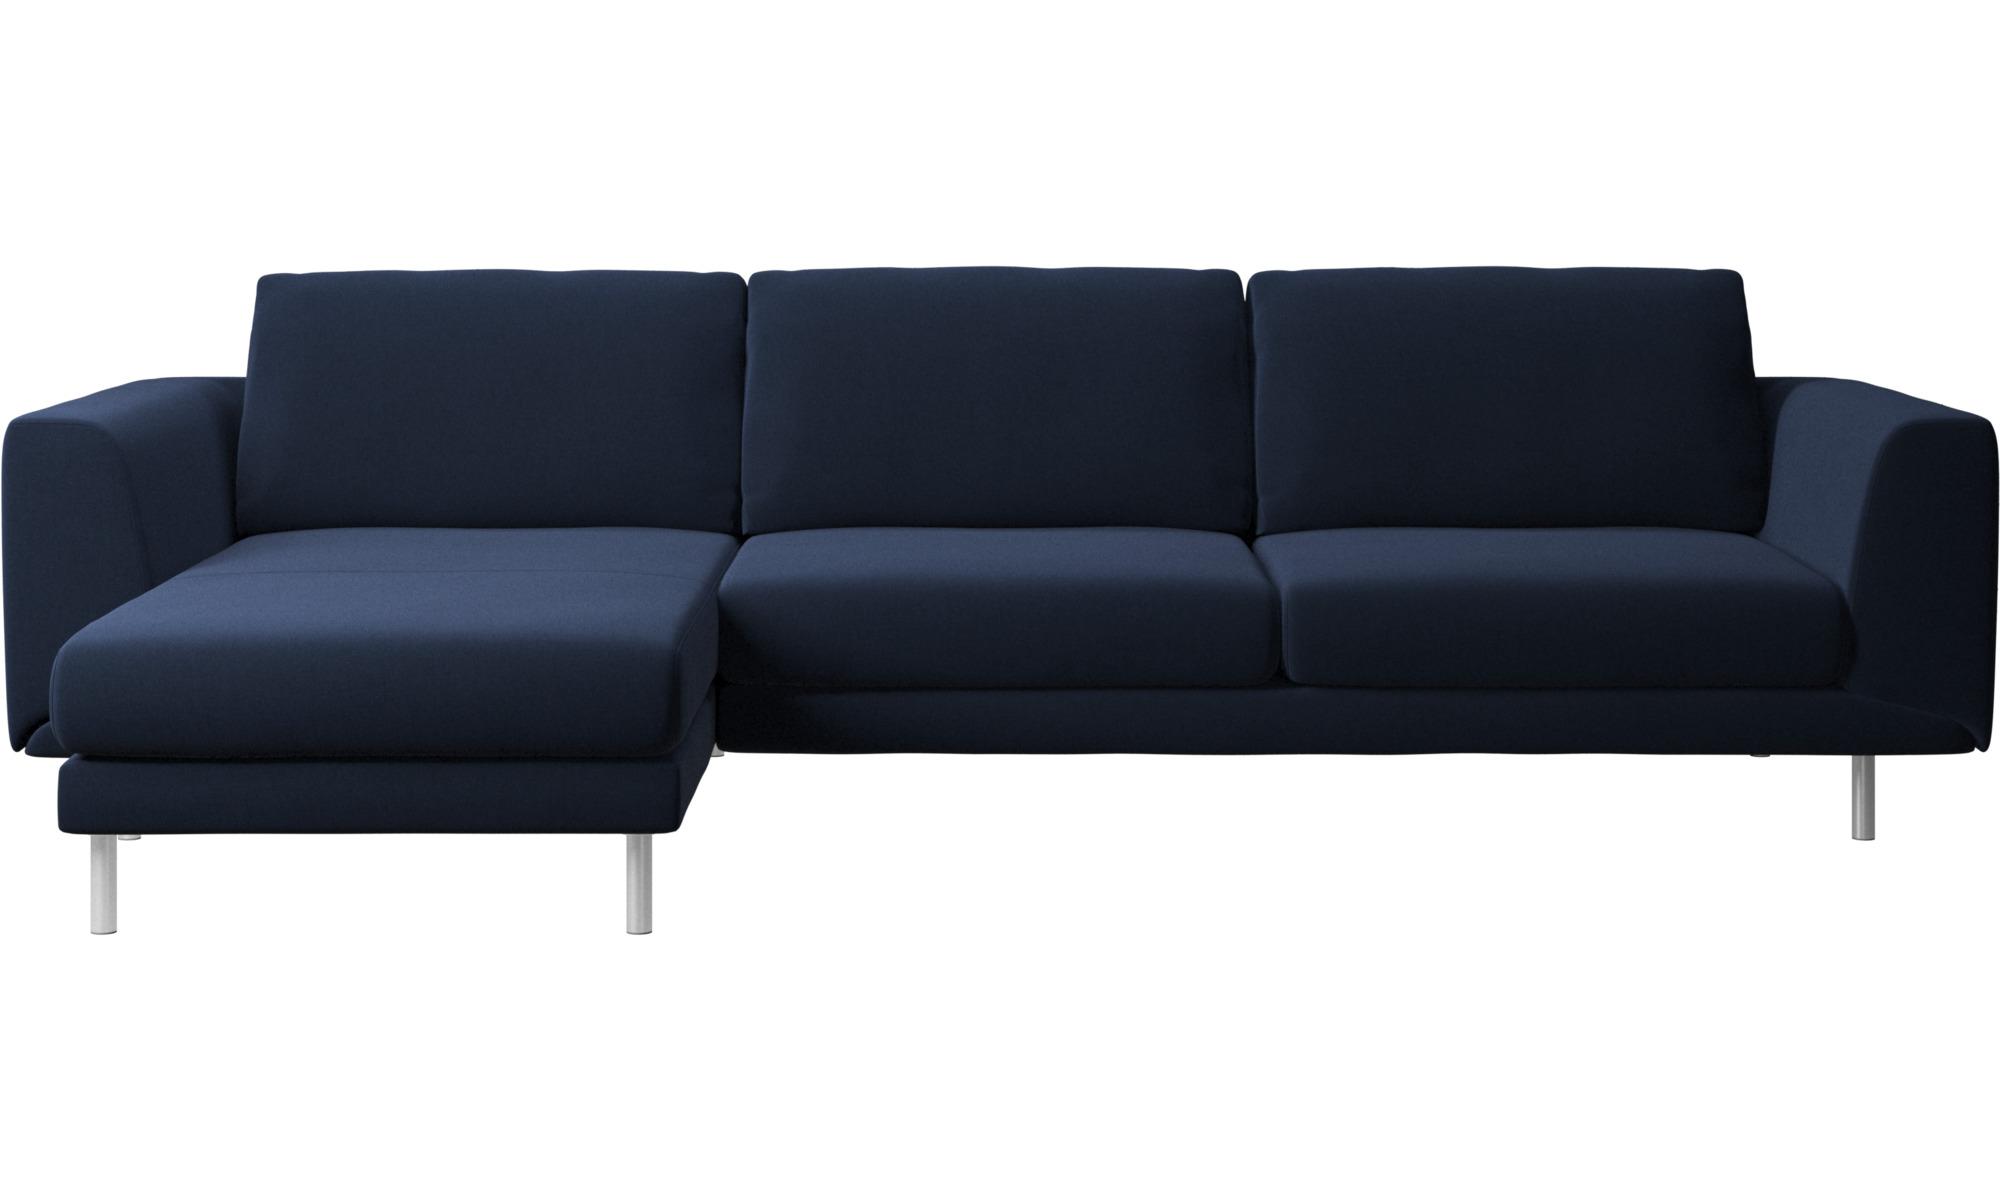 Sof s con chaise longue sof fargo con m dulo chaise for Chaise longue azul turquesa